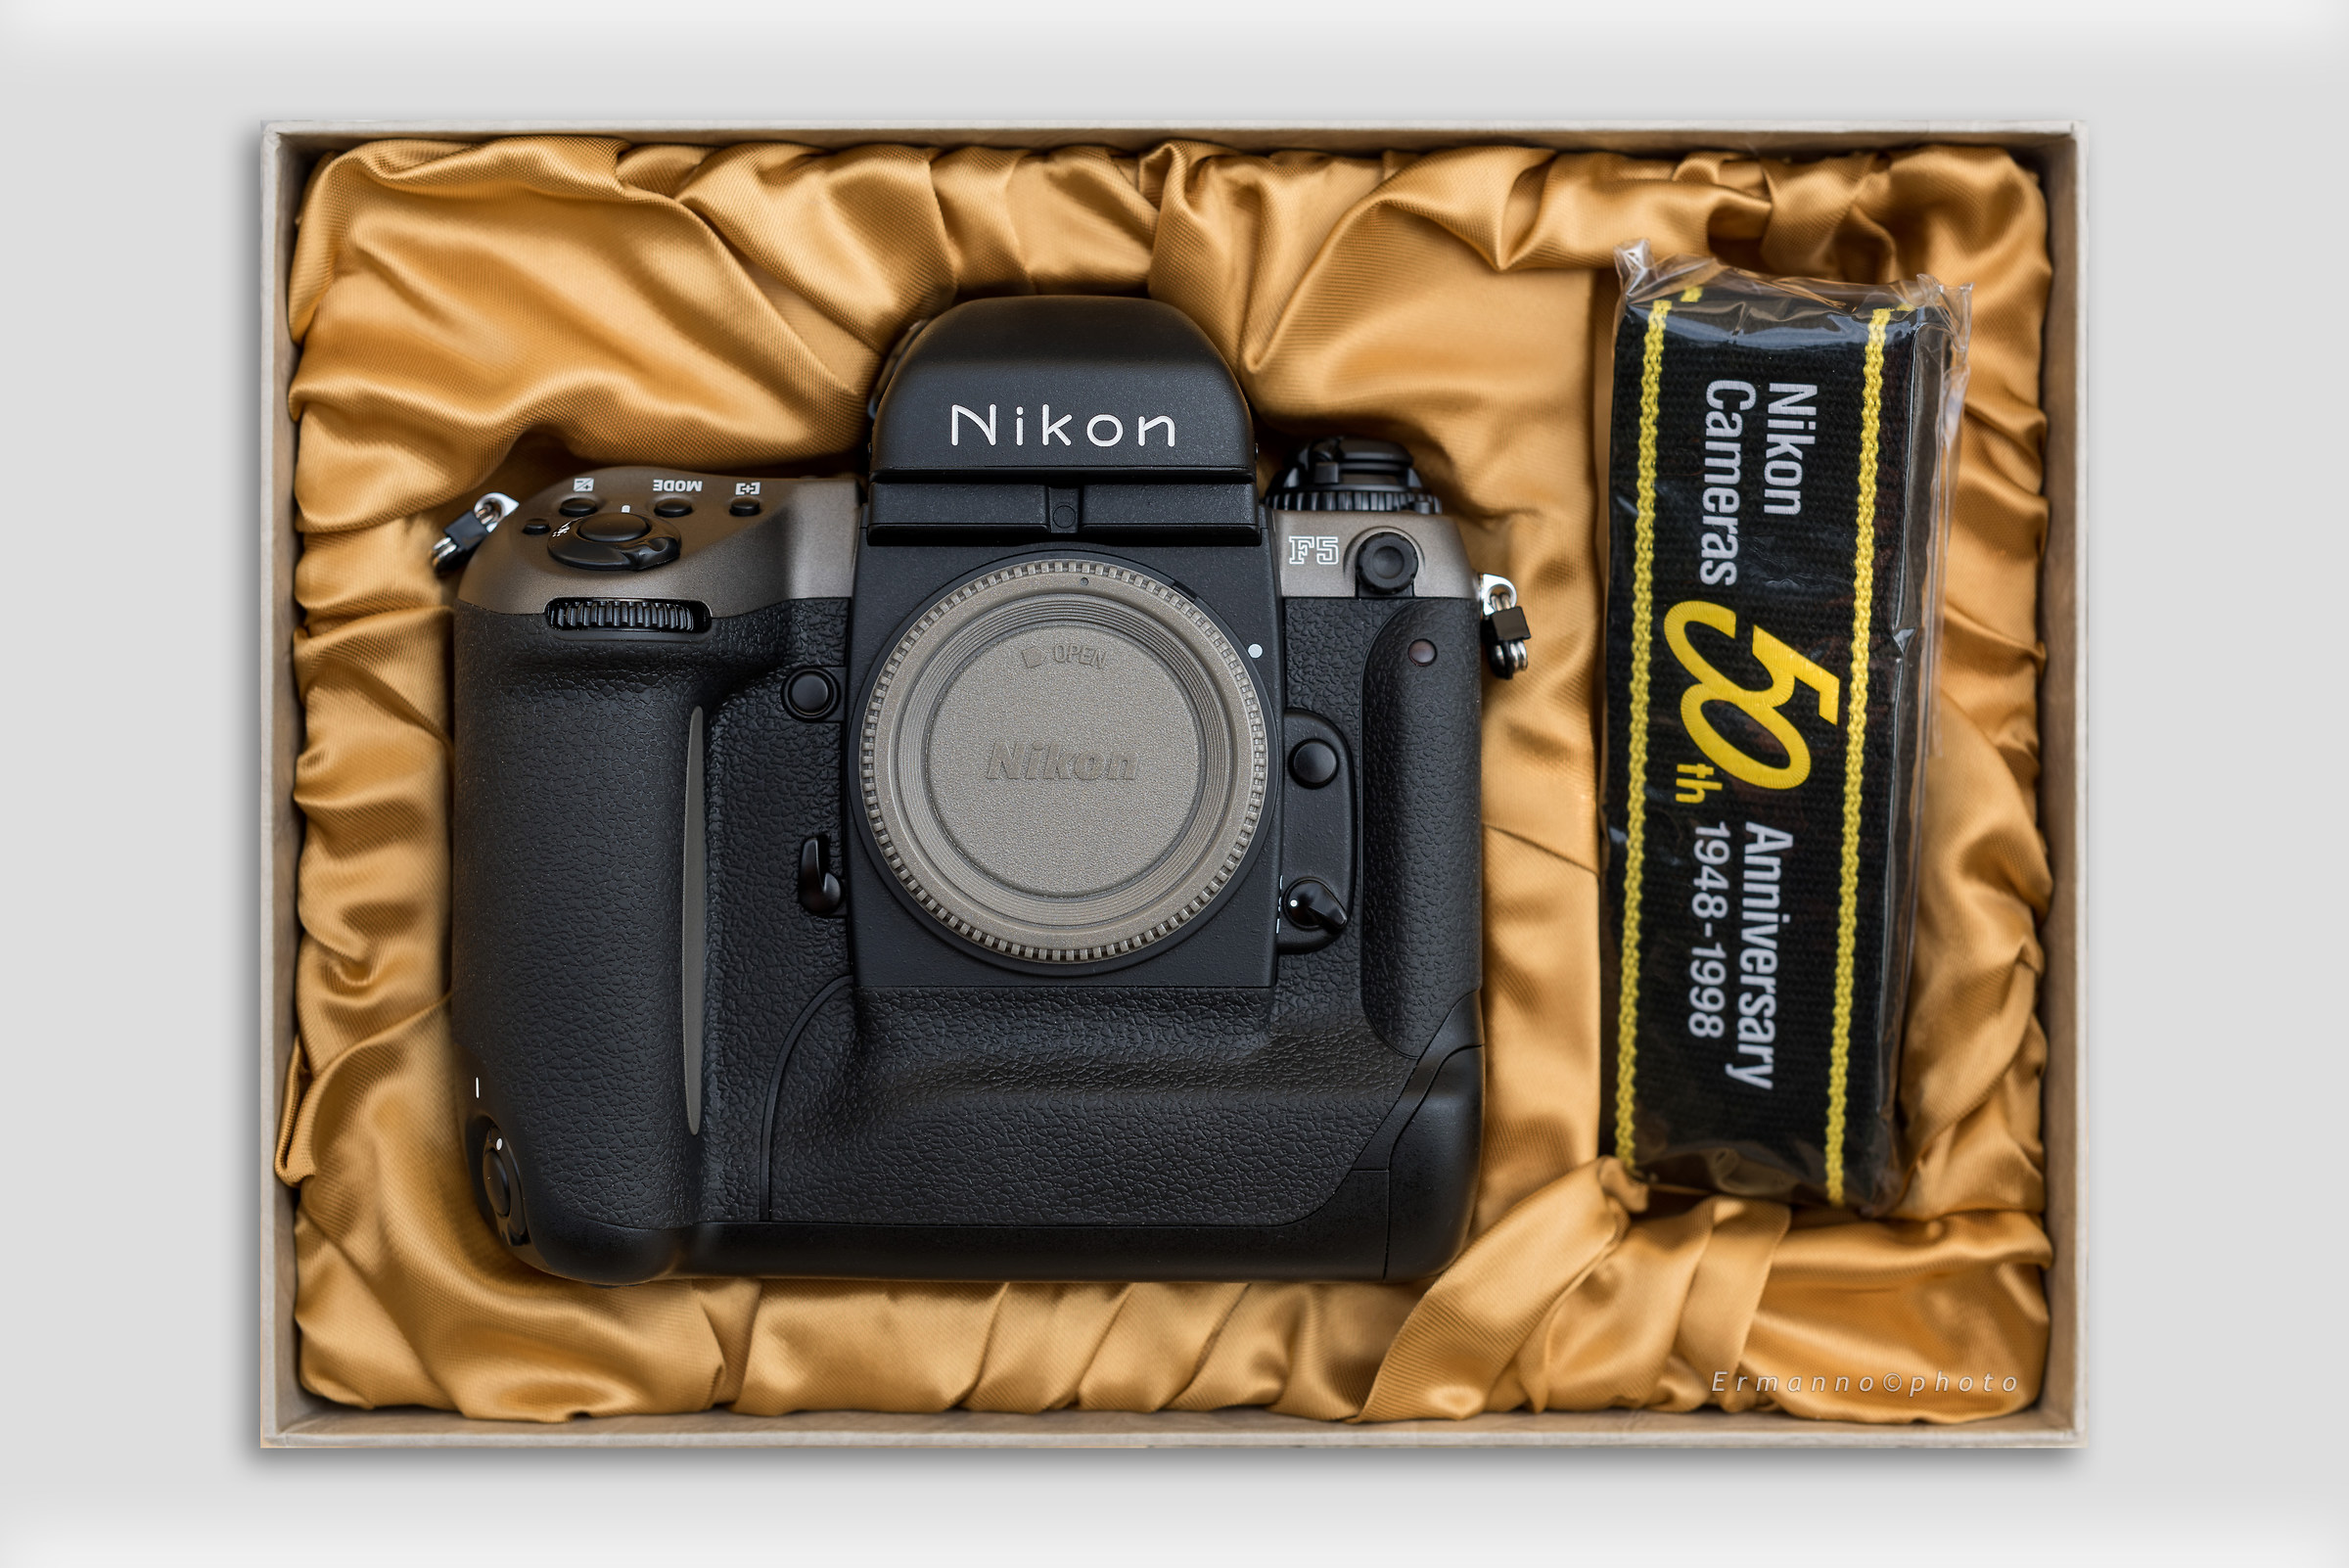 Nikon F5 Anniversary 50th...